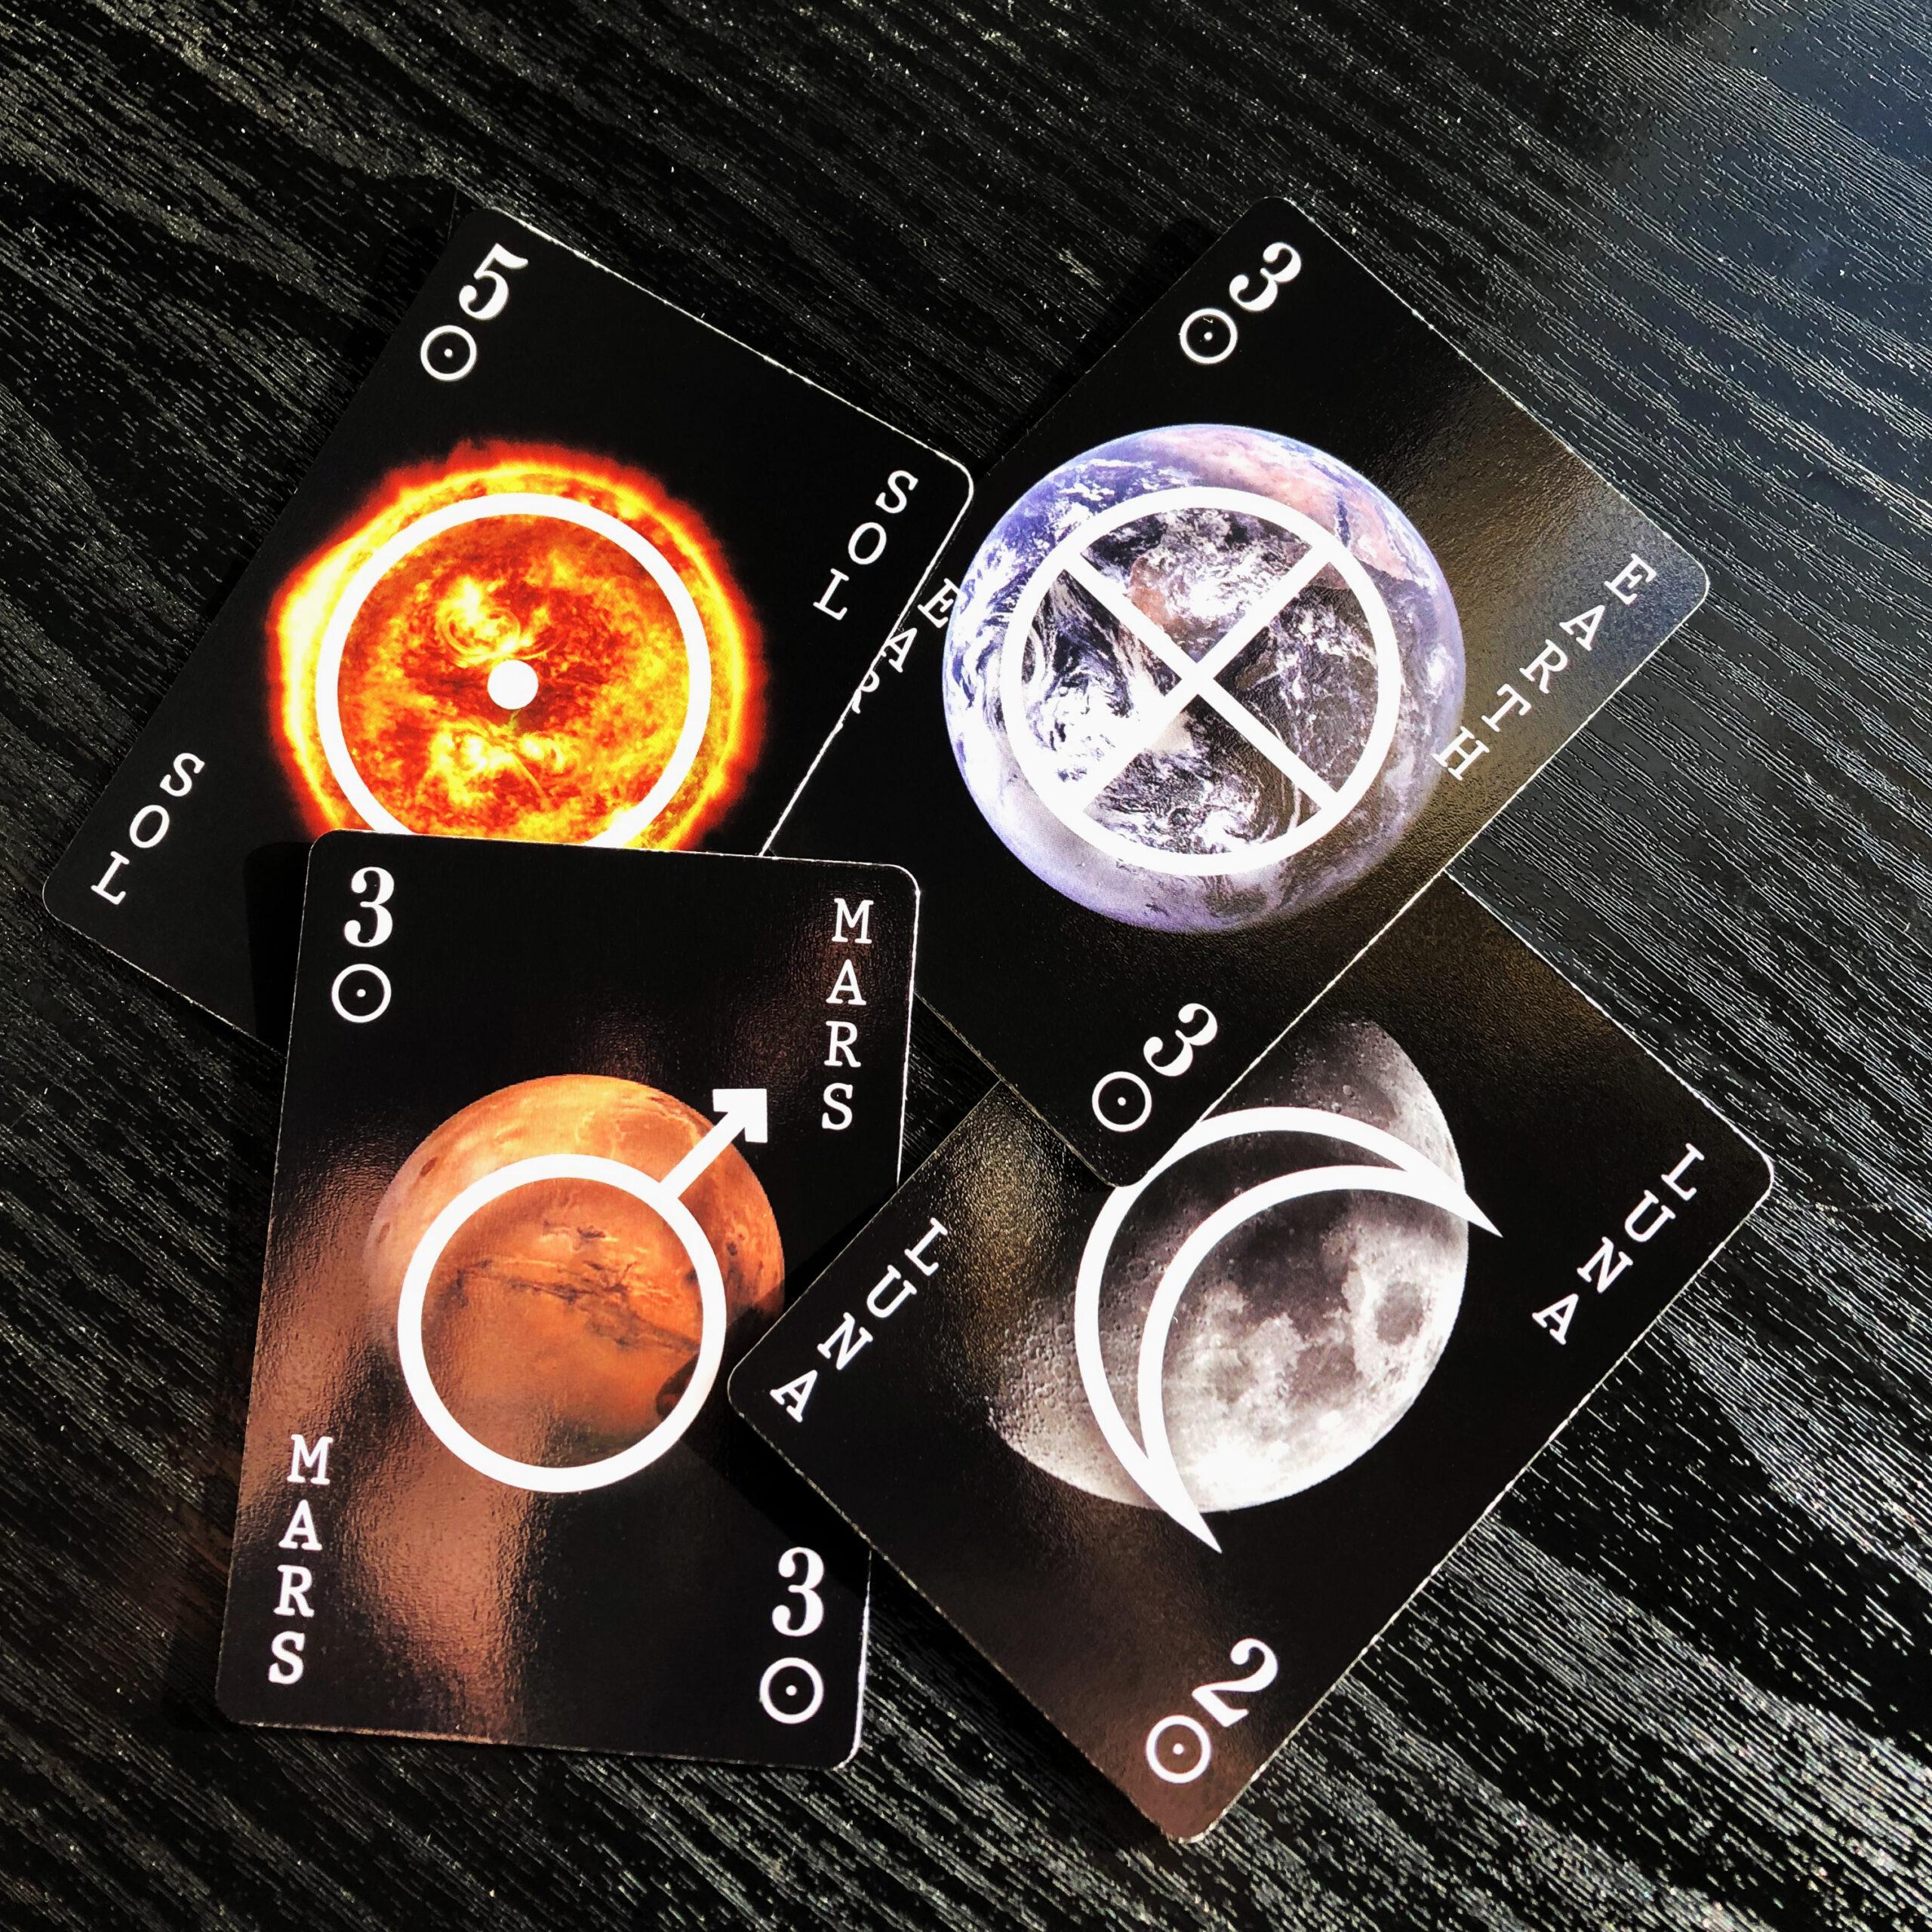 earth moon sun mars game cards